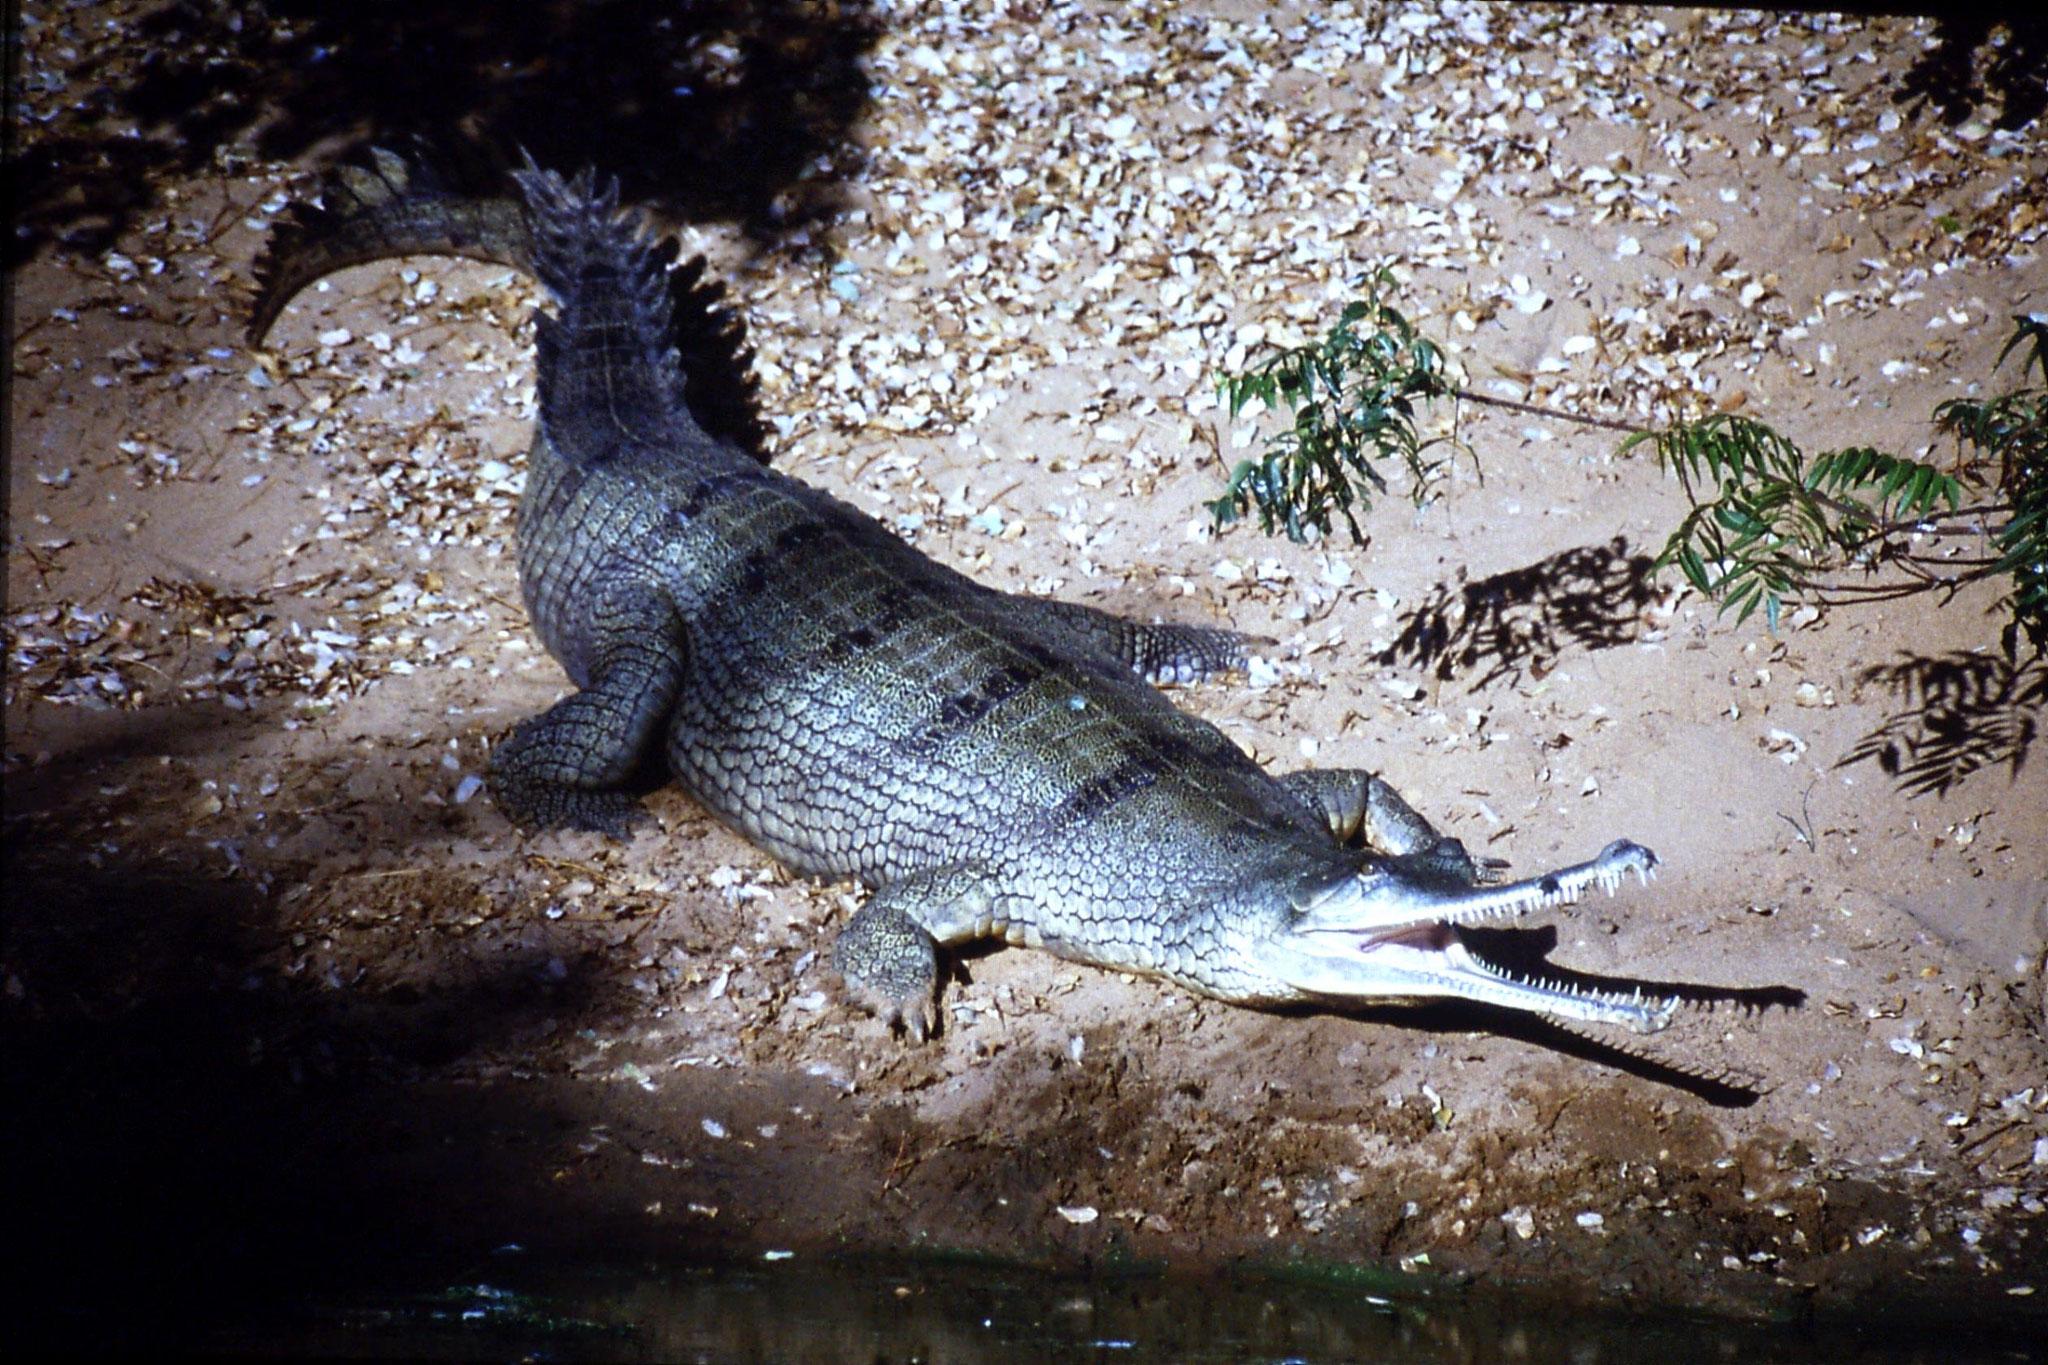 19/1/1990: 24: Madras crocodile park, Ganges gharial